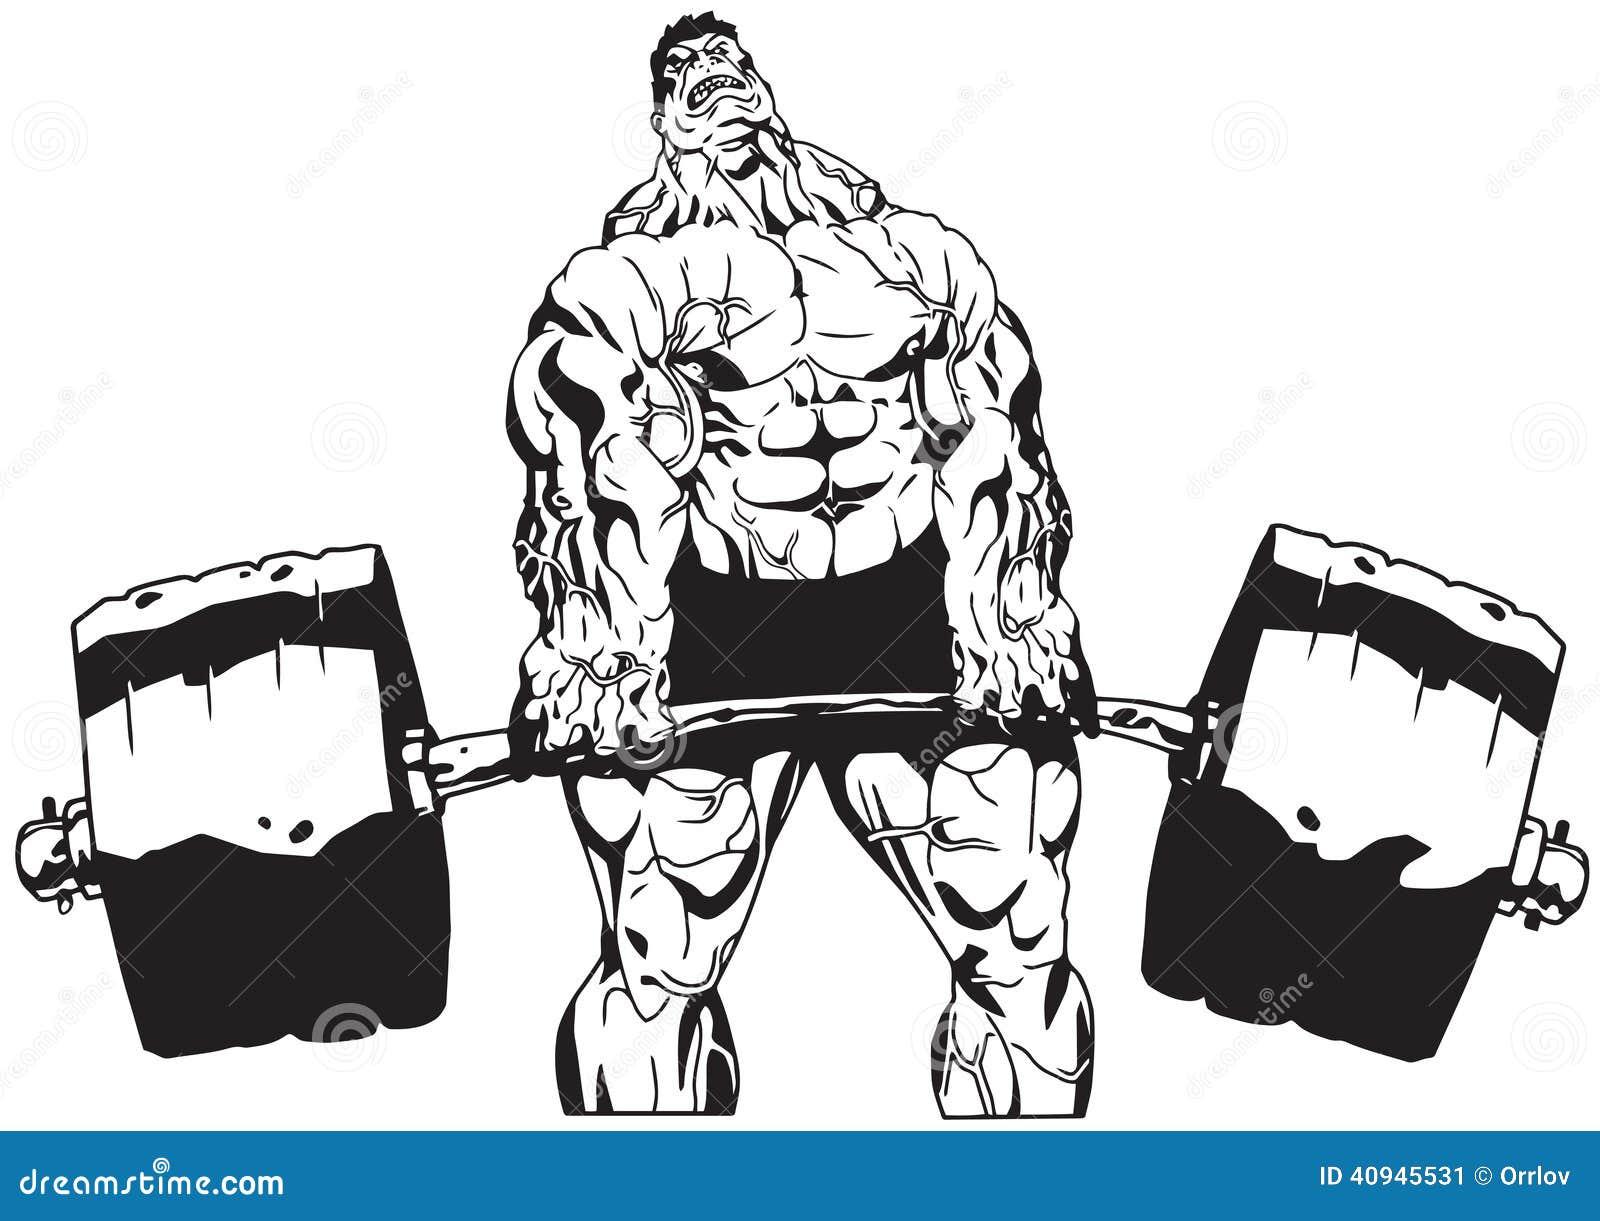 Bodybuilding Powerlifting Tom Platz Berserker new booklet 2016